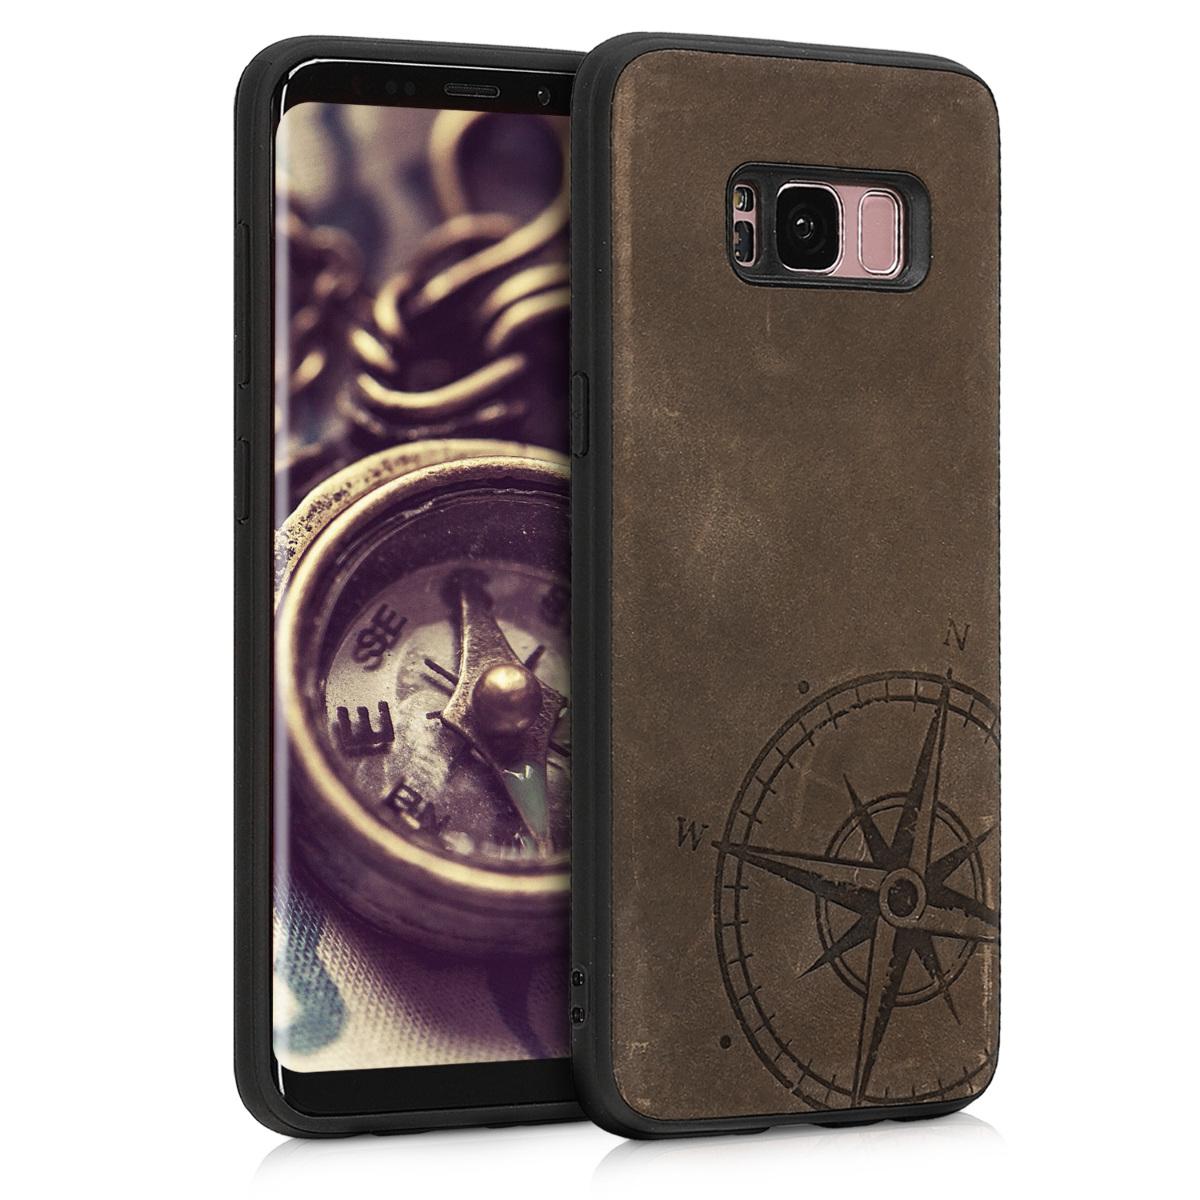 Kalibri Δερμάτινη Θήκη Samsung Galaxy S8 - Brown (46627.01)